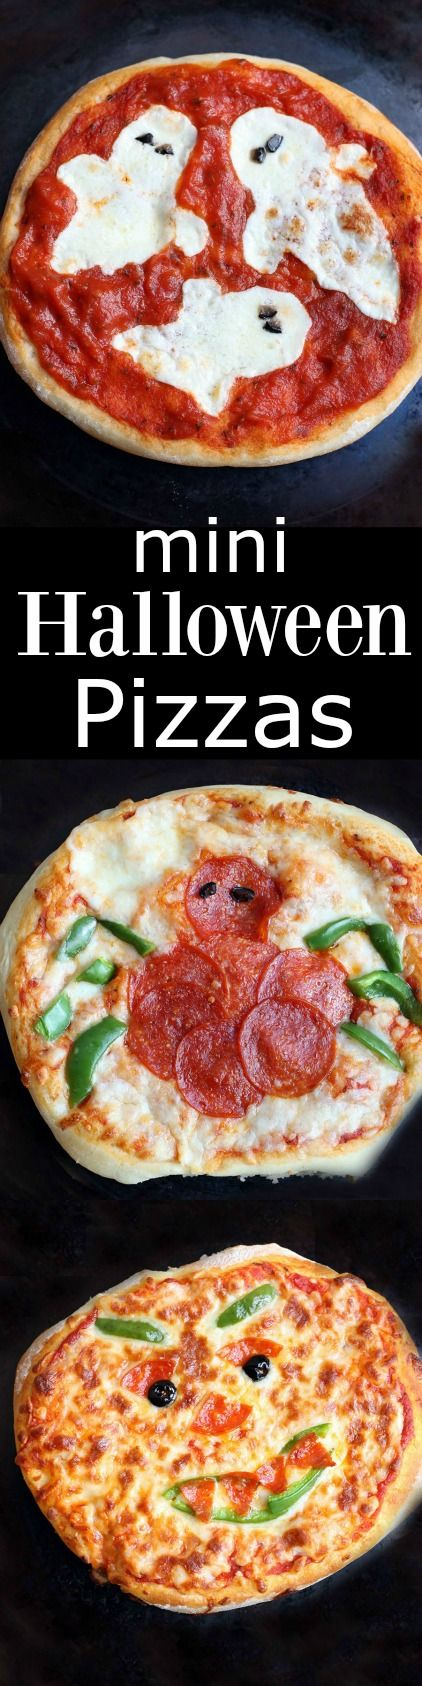 Mini halloween pizzas recipe easy halloween dinner ideas and pizzas easy mini halloween pizzas make the perfect halloween dinner kids love this fun halloween meal forumfinder Gallery